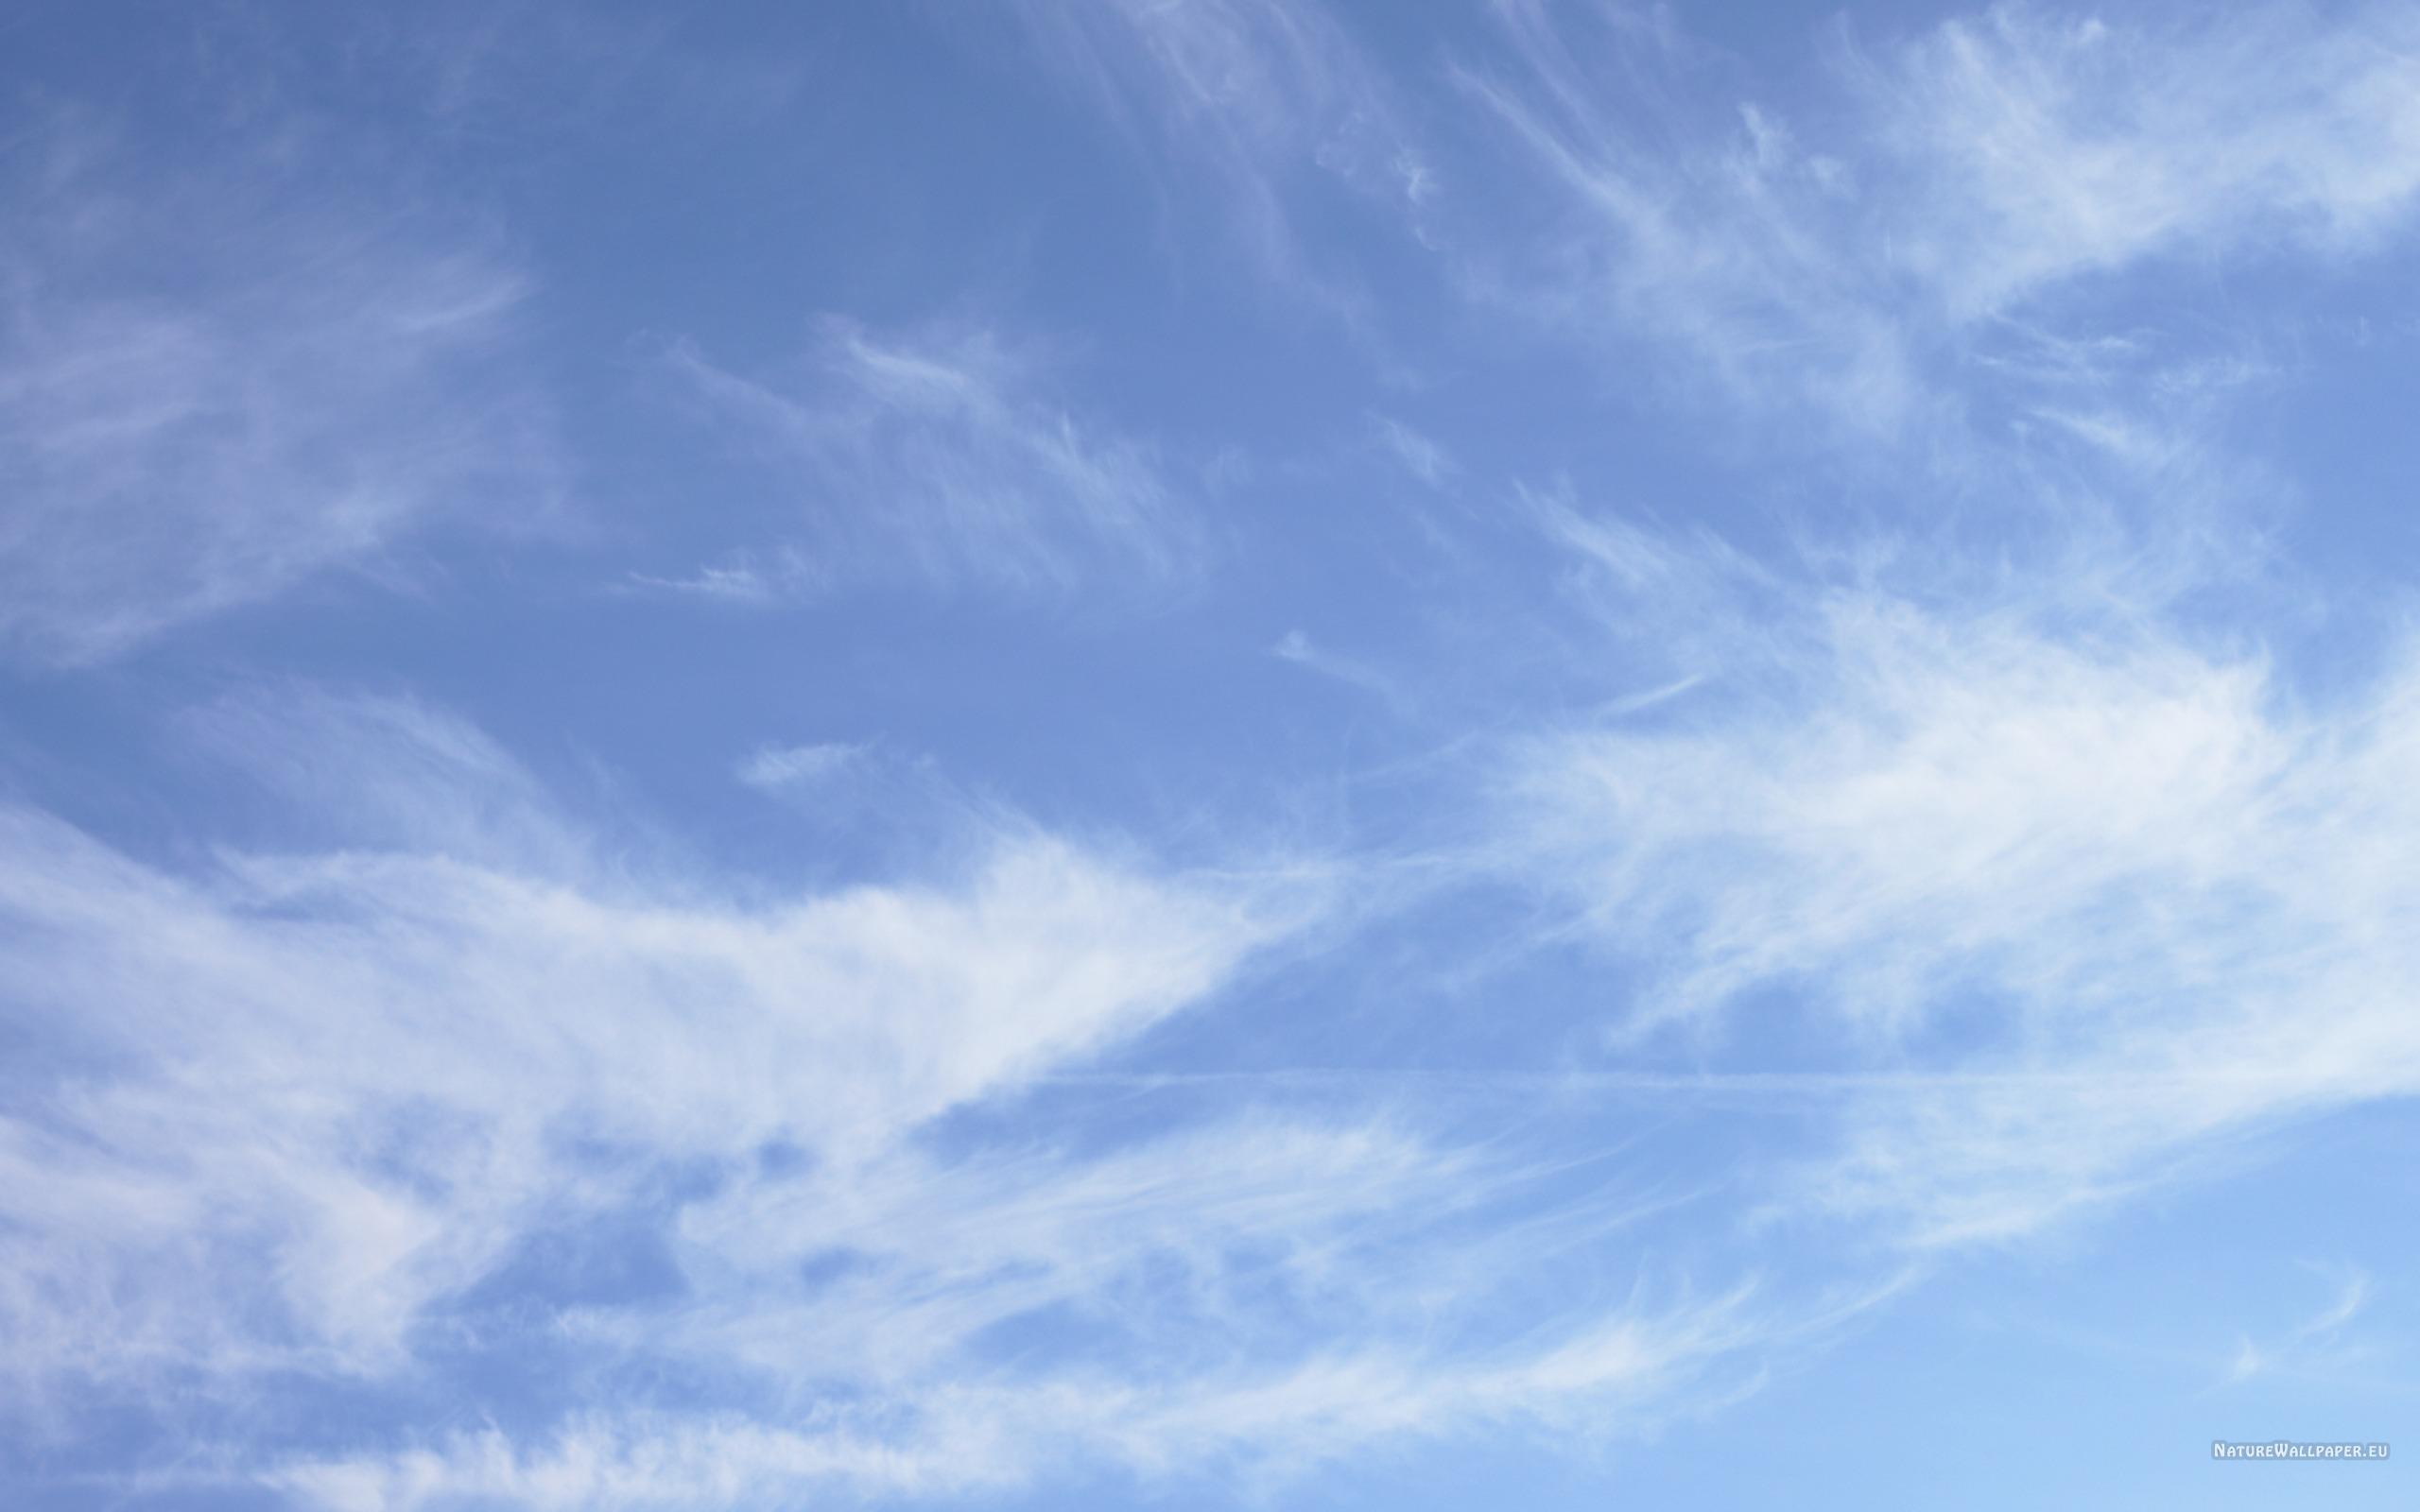 2560x1600 wallpaper Vanishing Clouds Wallpaper Background 2560x1600